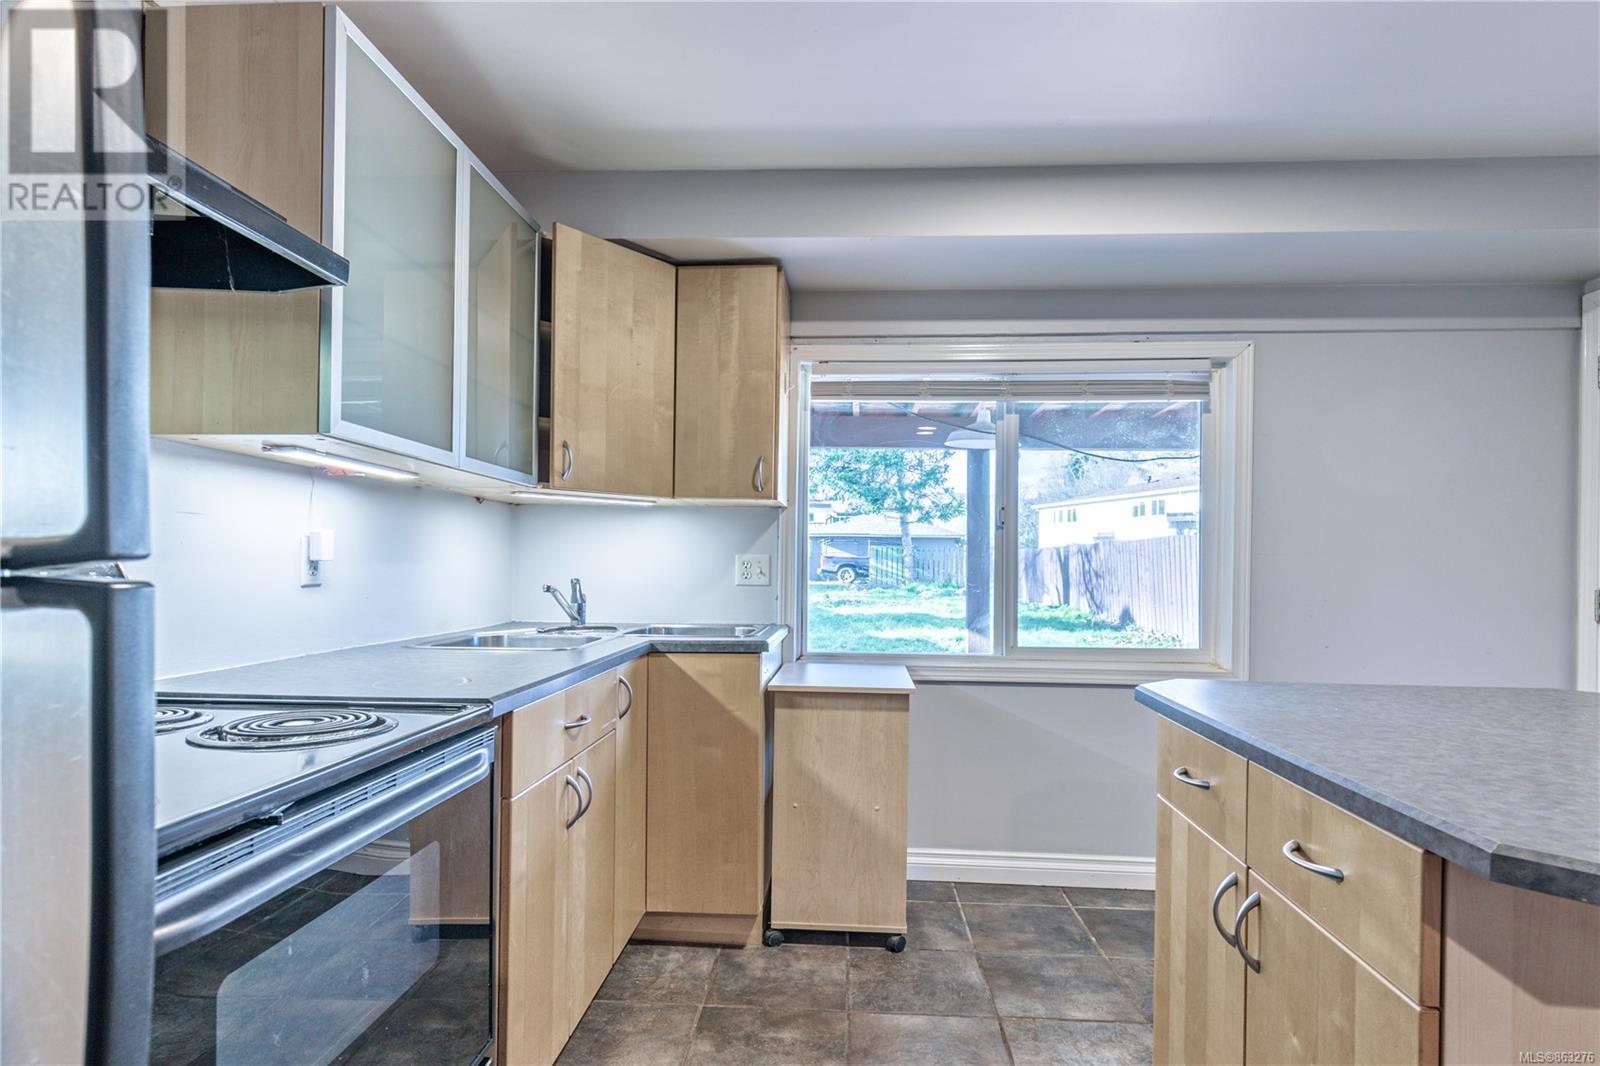 673 Winchester Ave, Nanaimo, British Columbia  V9R 4B6 - Photo 6 - 863276